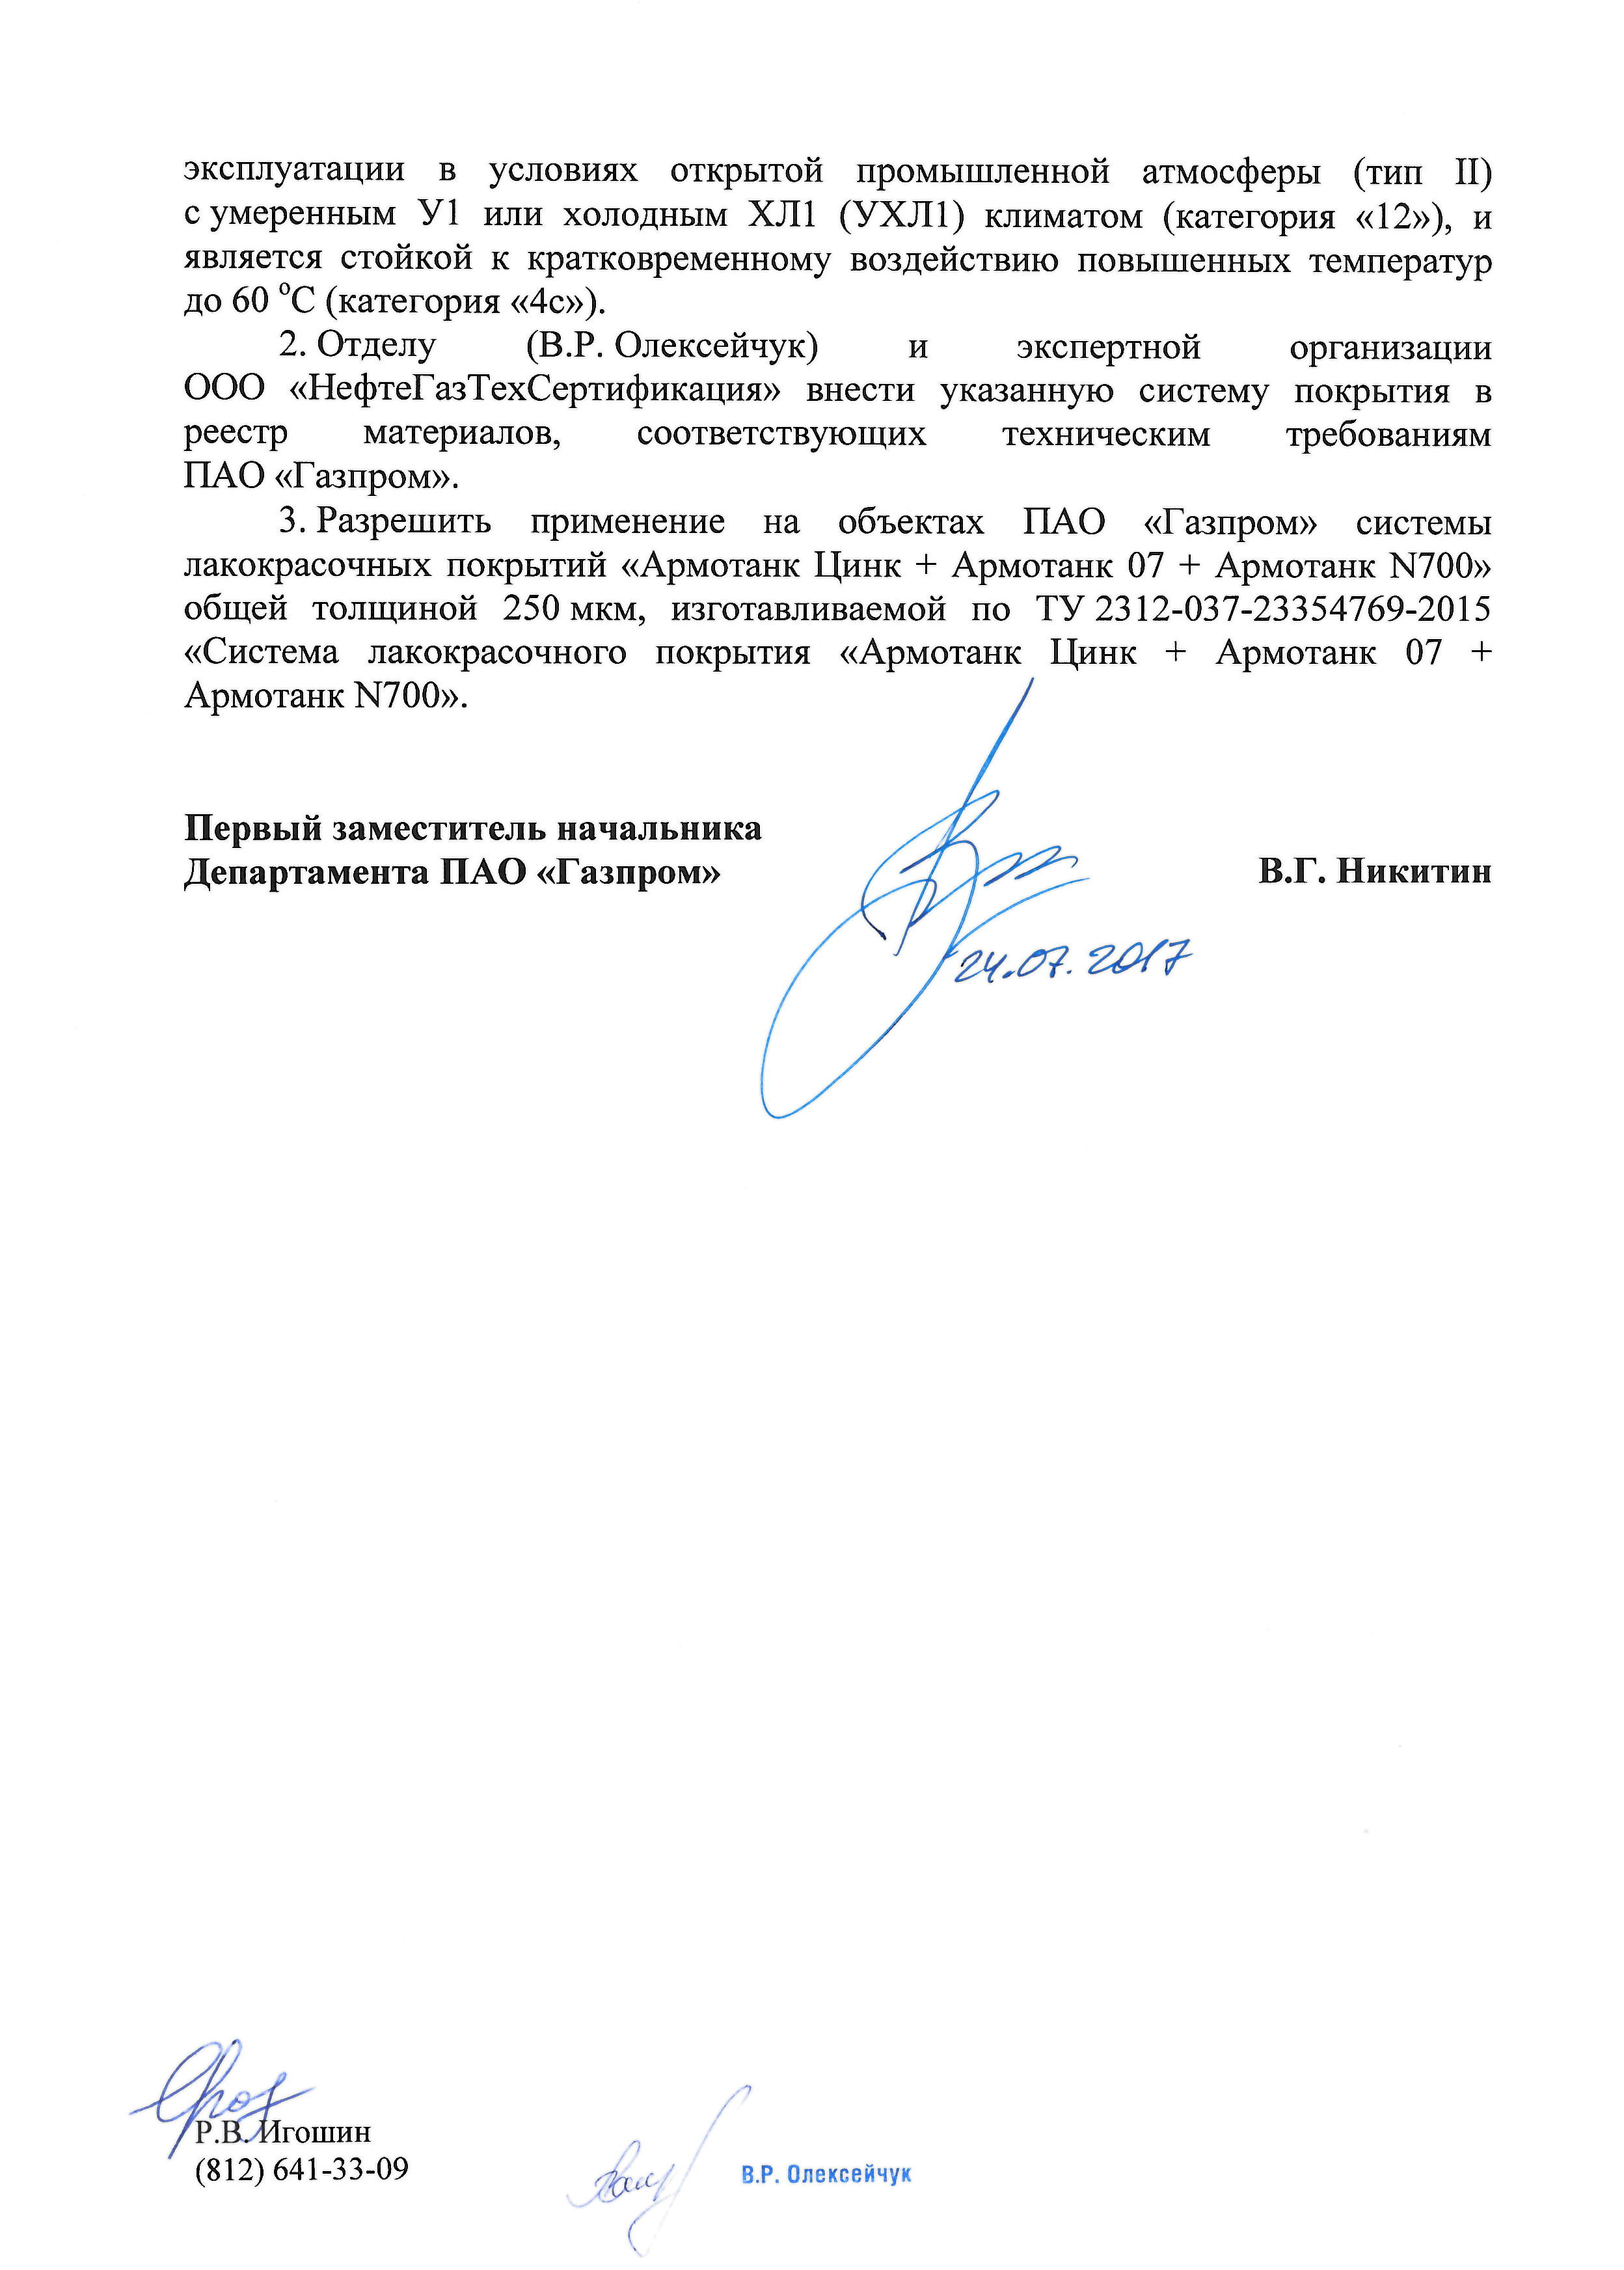 Газпром Армотанк Цинк+07+N700_Страница_2